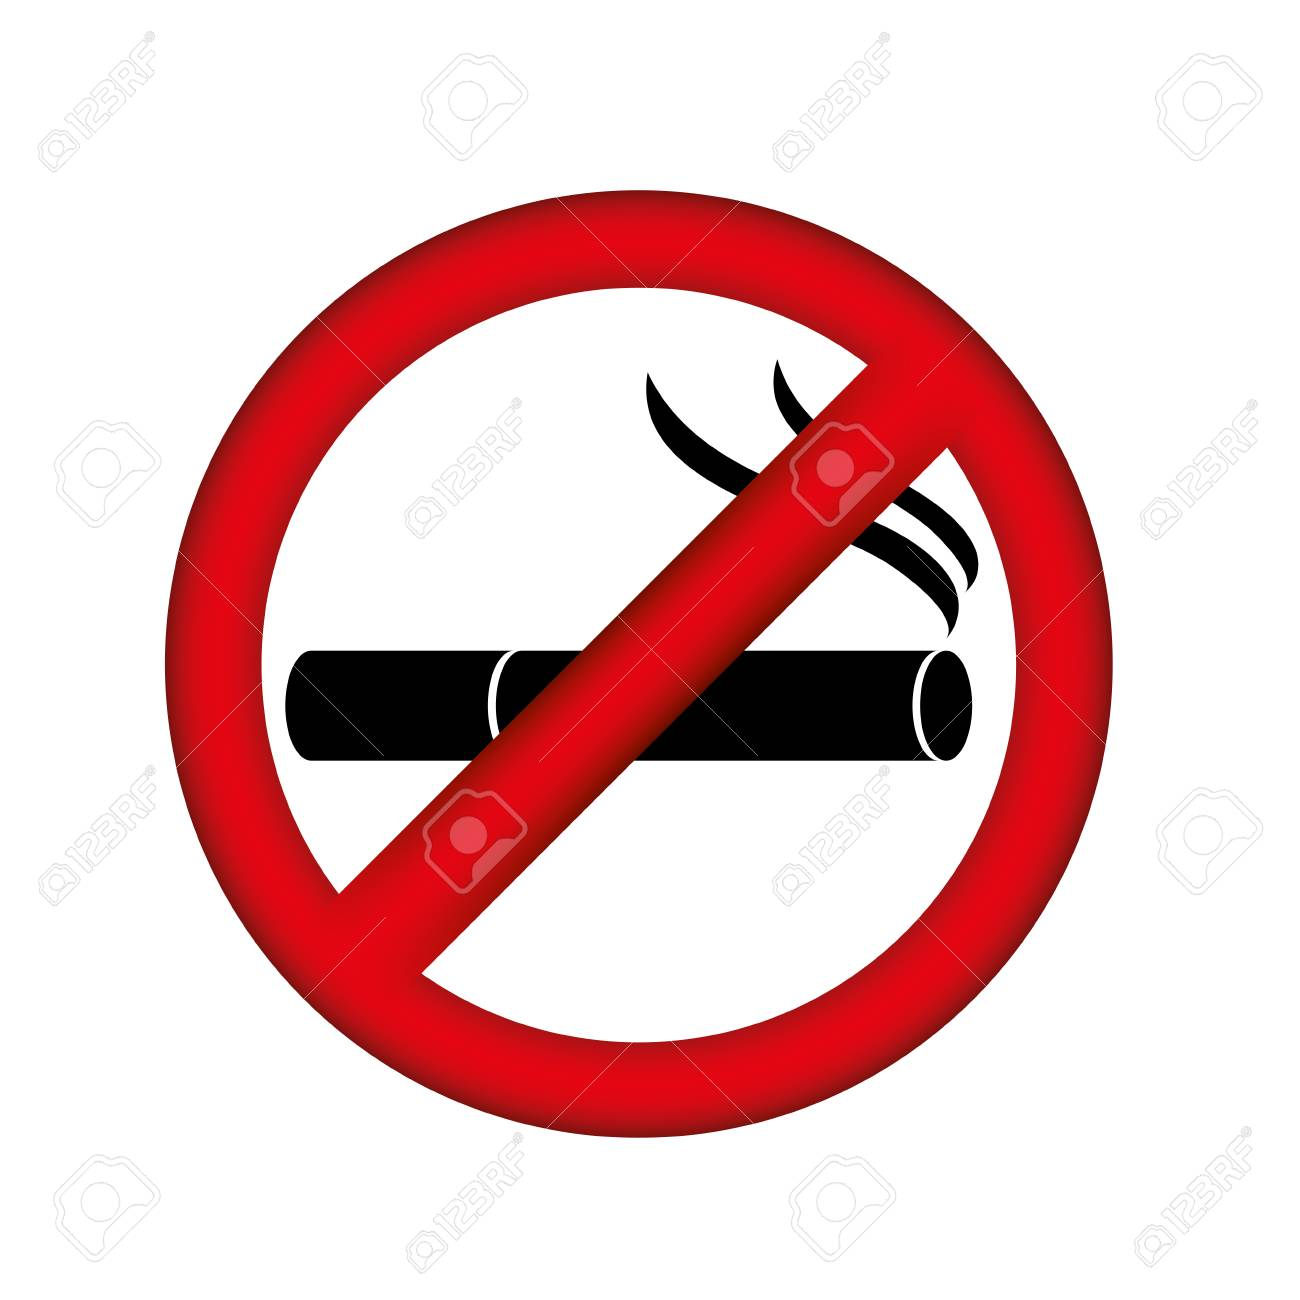 Symbol no smoking icon vector illustration design royalty free symbol no smoking icon vector illustration design stock vector 74323280 biocorpaavc Image collections